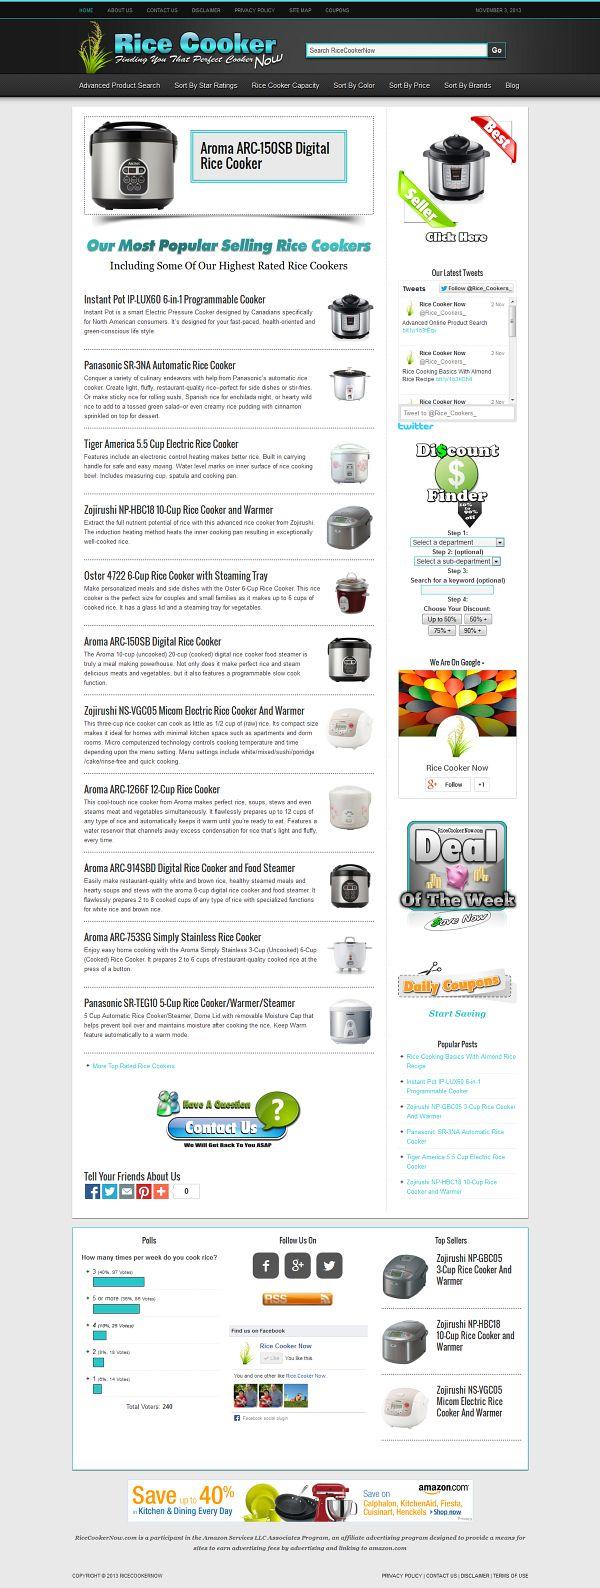 Rice Cooker Website For Sale